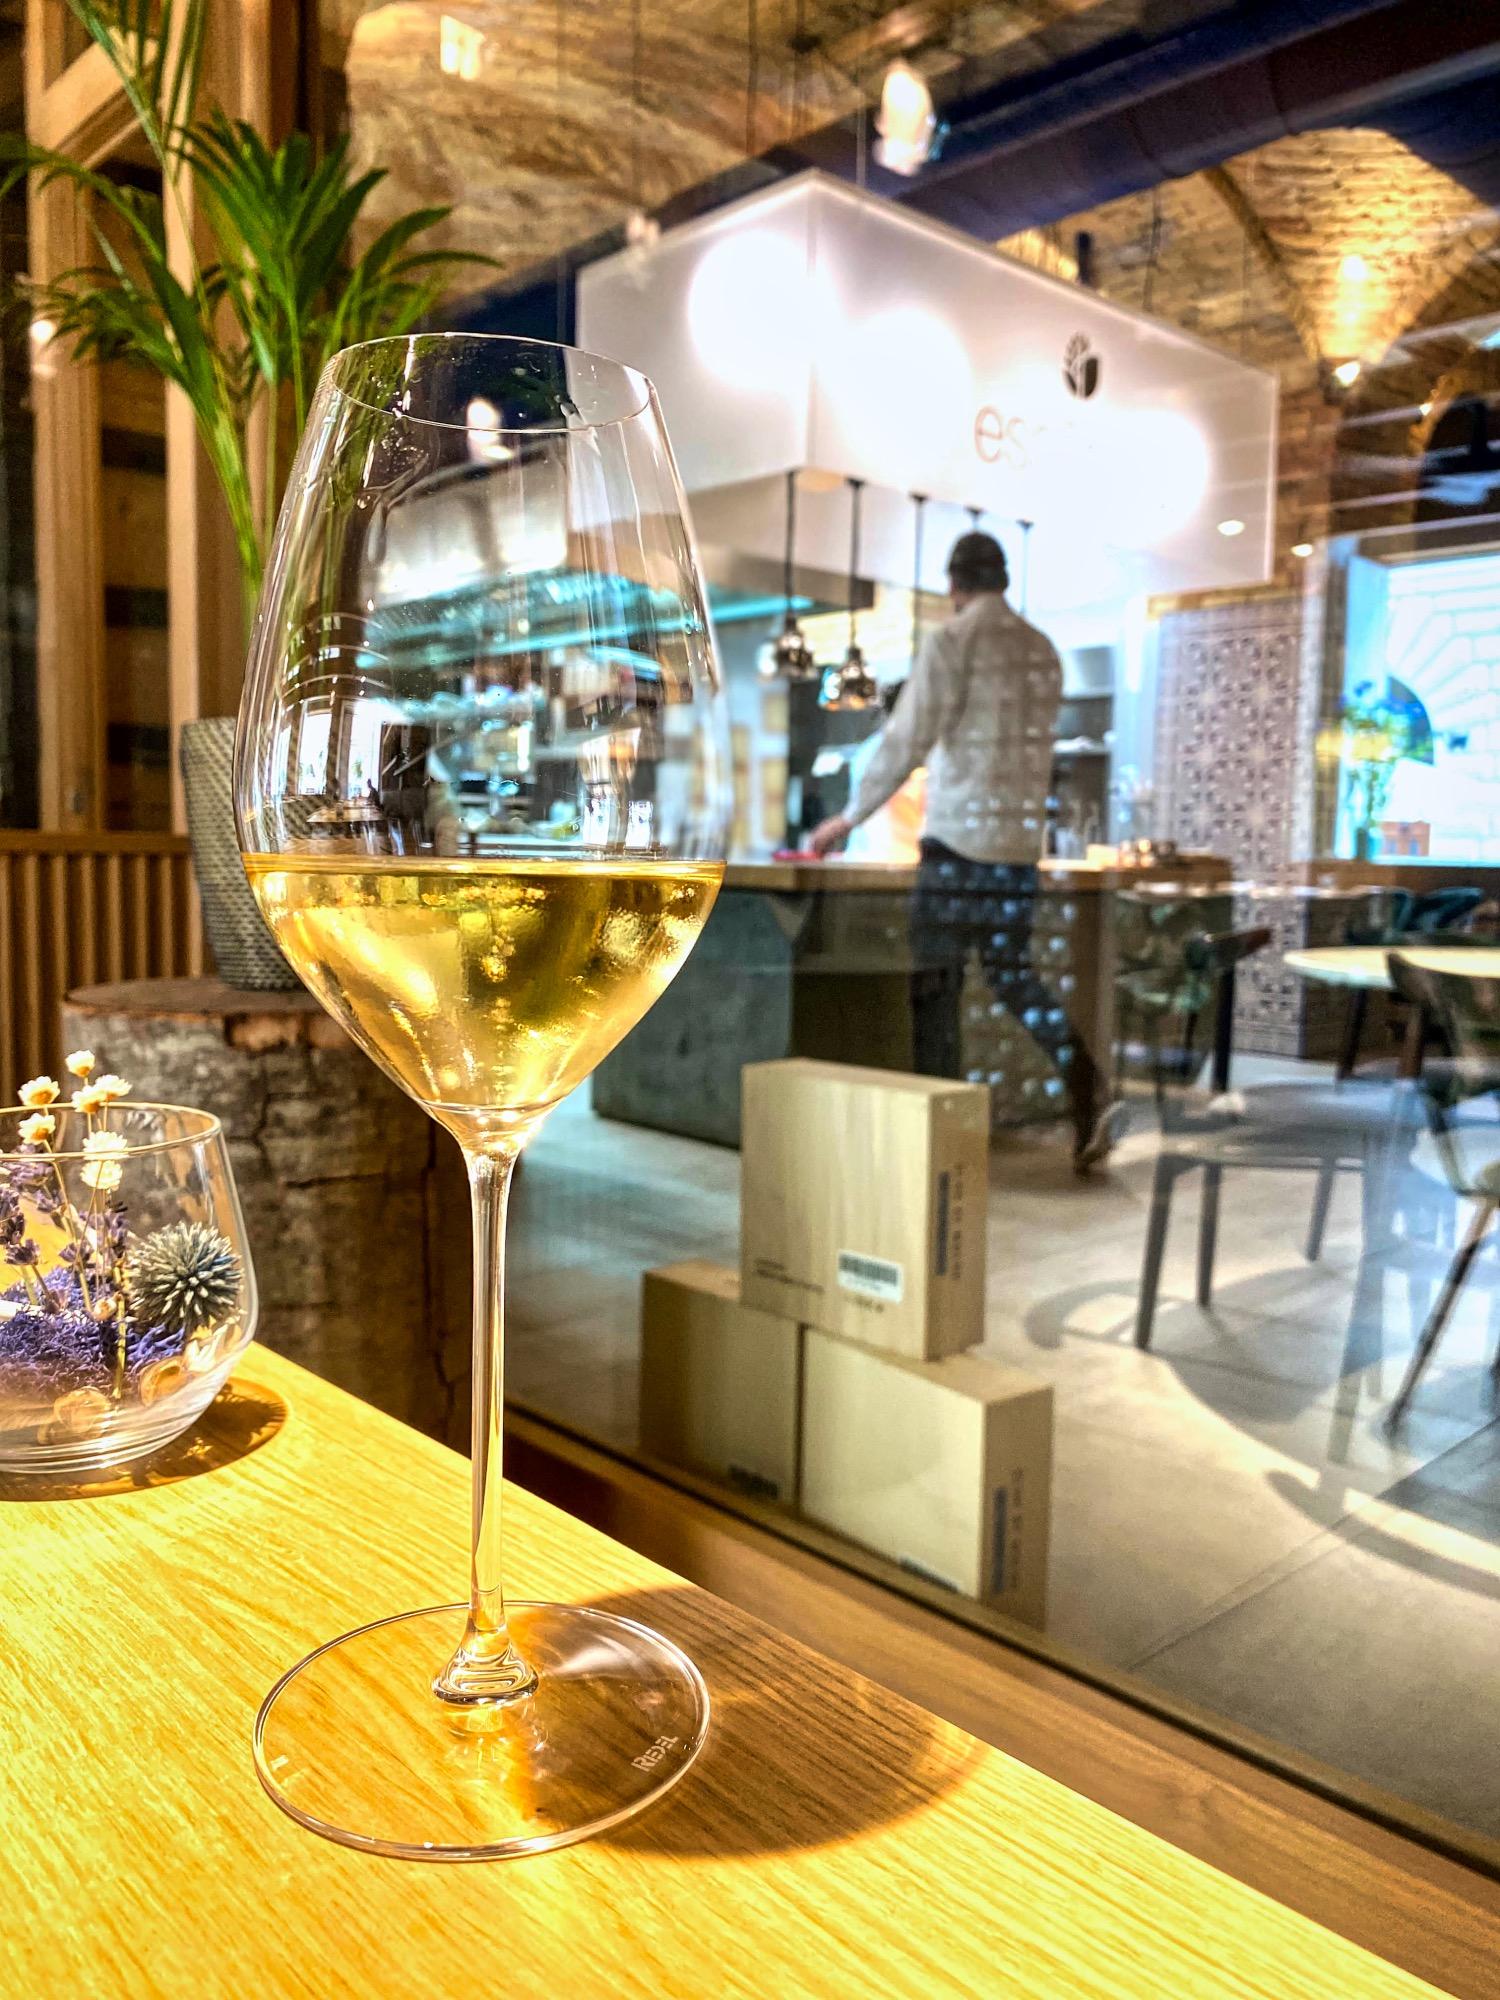 img_5974_essencia_tiago_michelin_budapest_restaurant_jokuti_vilagevo.jpeg